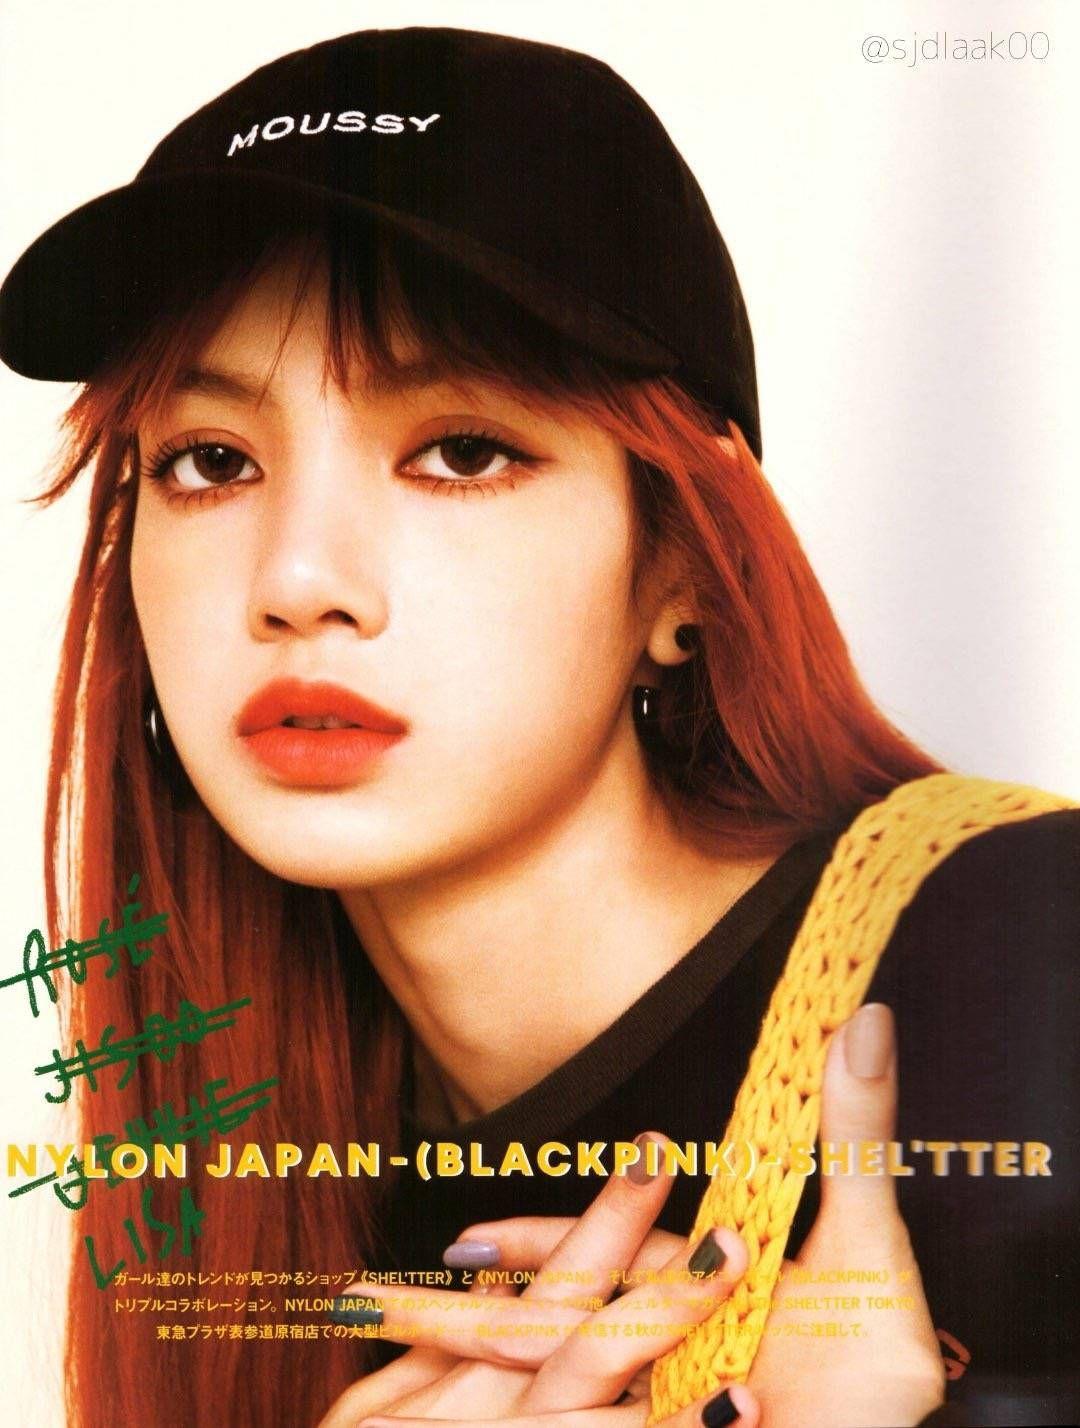 Pin By Jongkaisus On Blackpink In 2018 Pinterest Blackpink Lisa